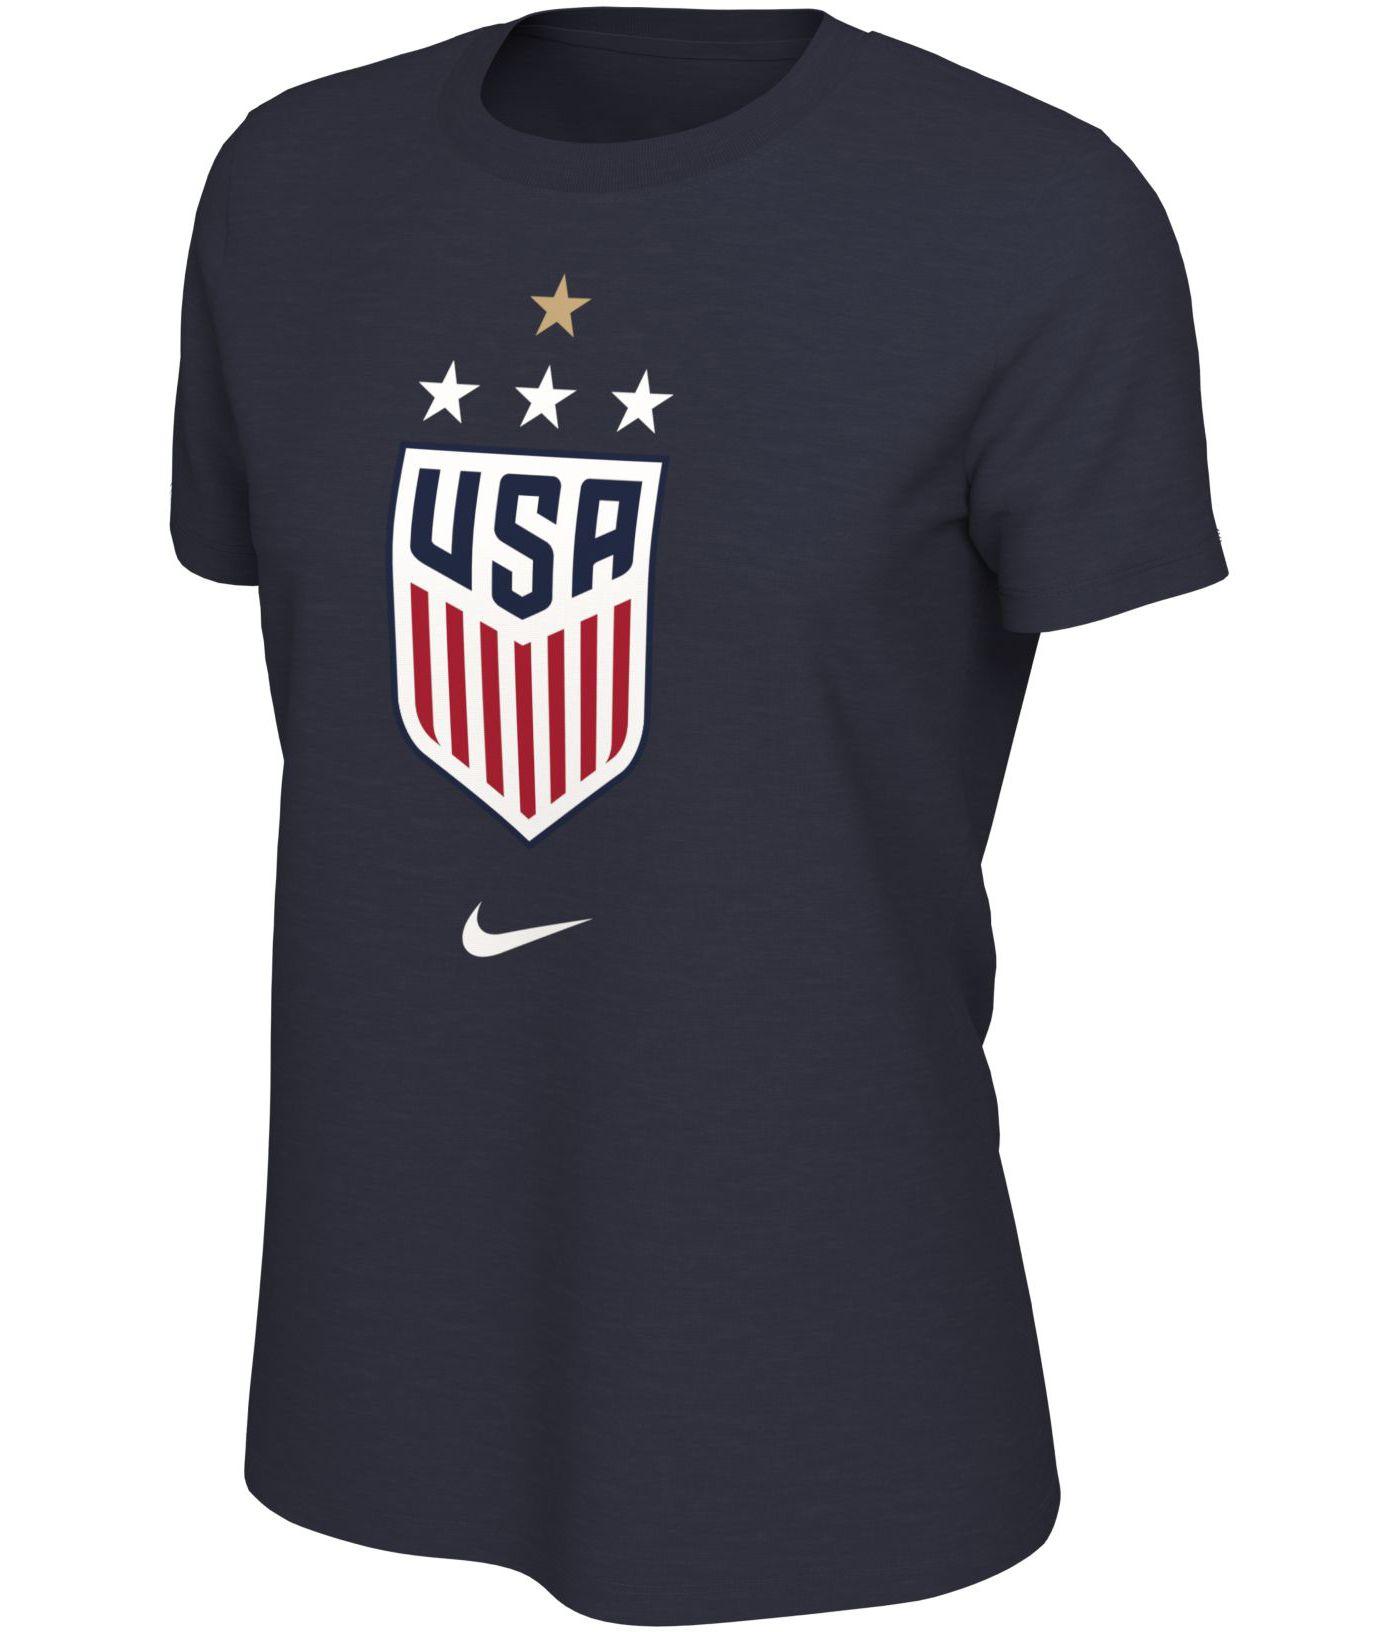 Nike Women's 2019 FIFA Women's World Cup Champions USA Soccer 4-Star Navy T-Shirt